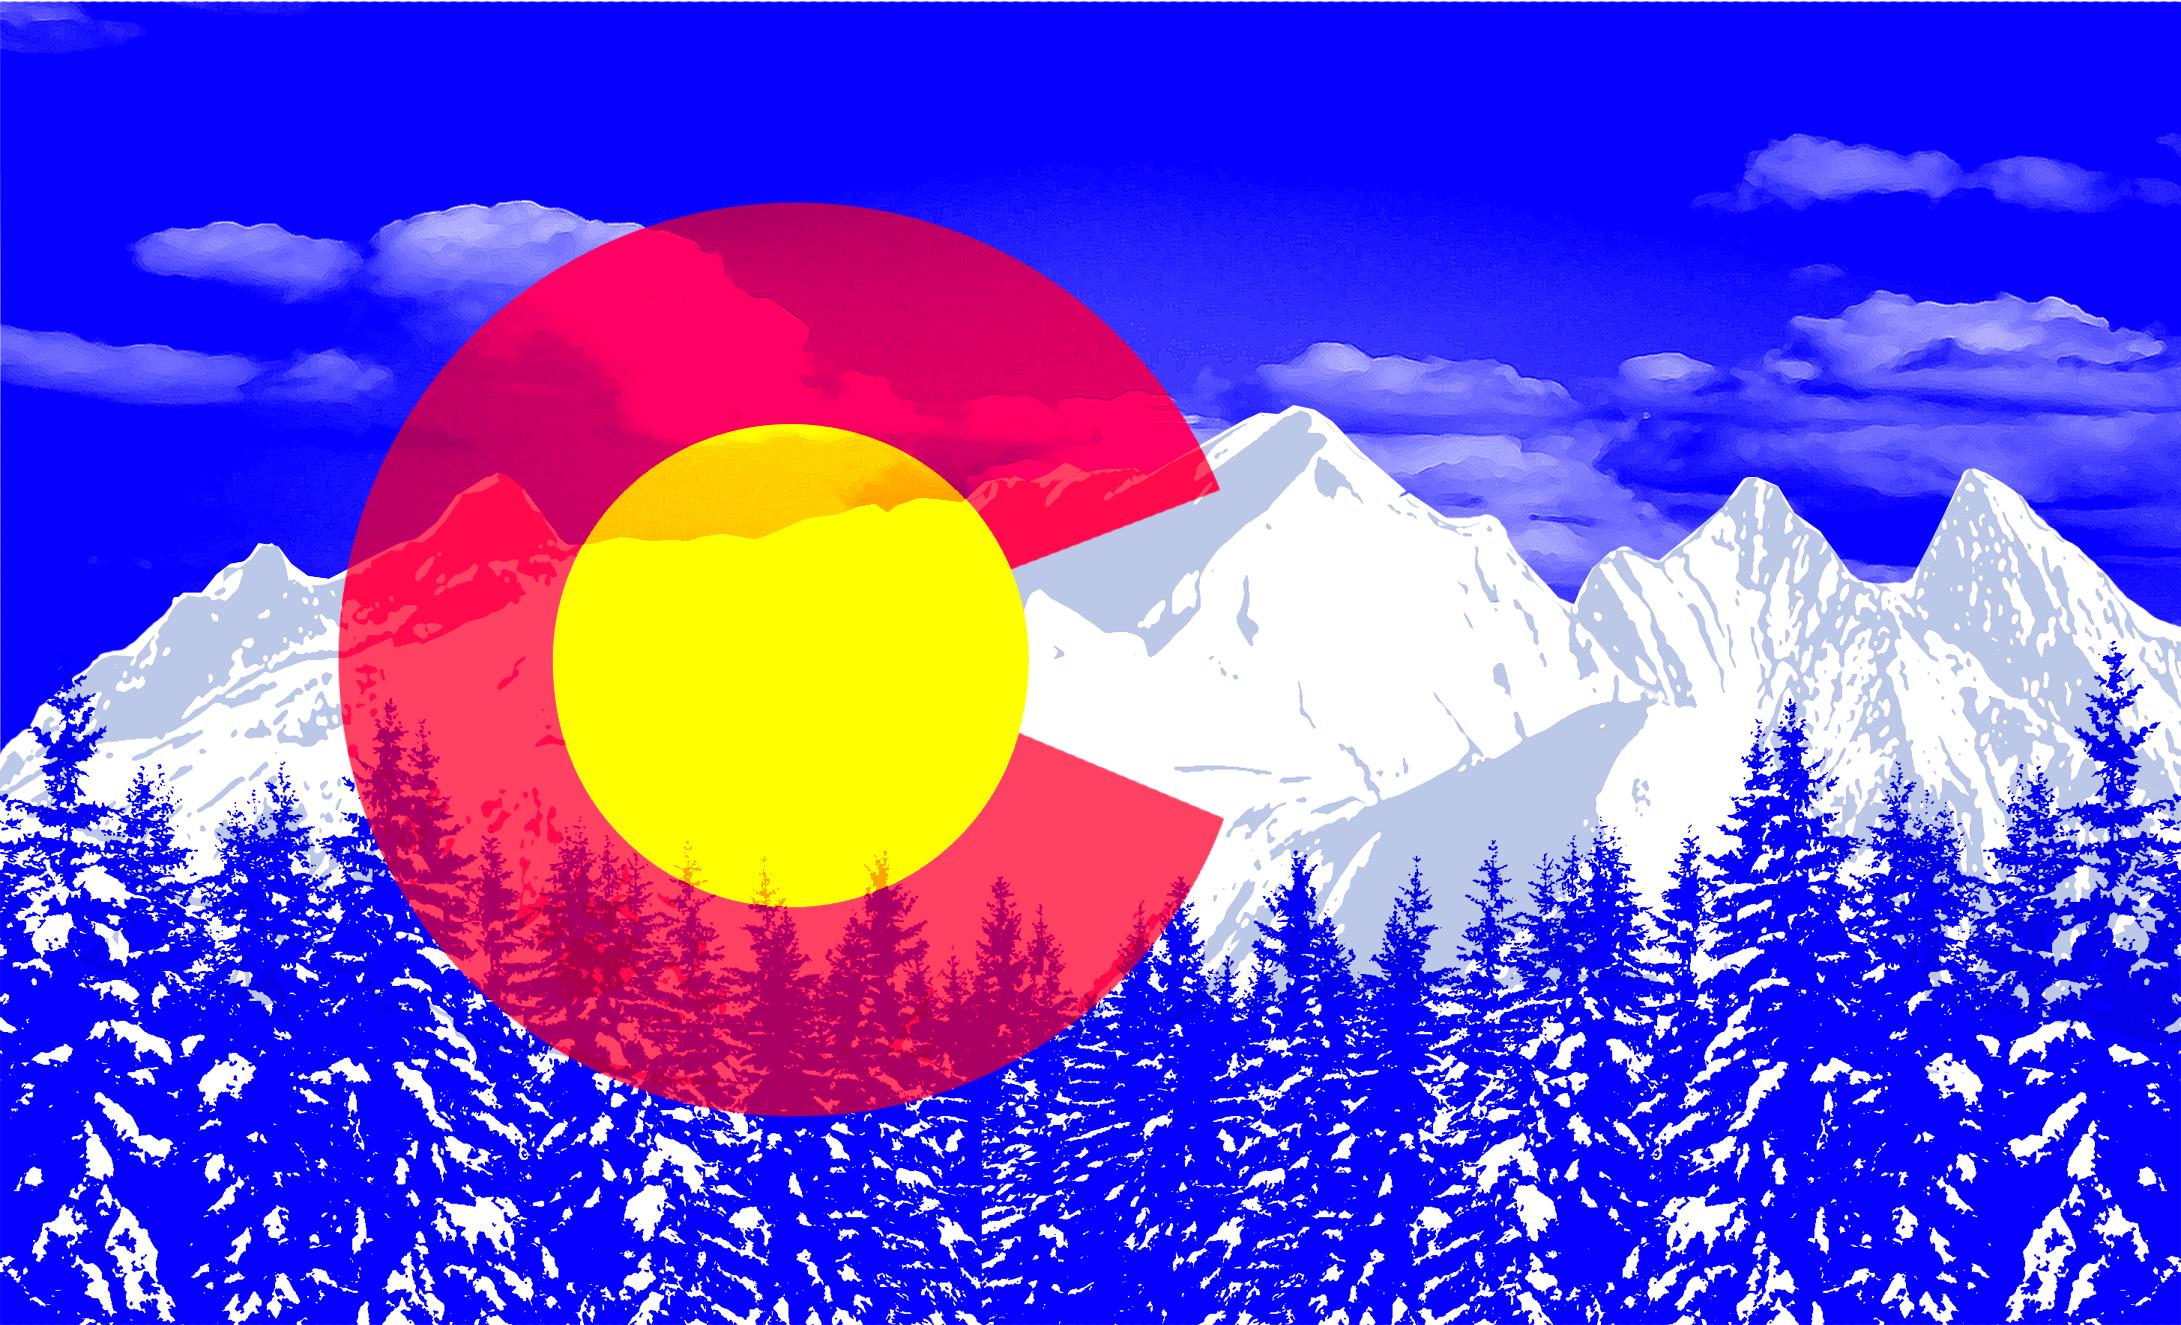 Colorado Flag Wallpaper - WallpaperSafari  Colorado Flag W...